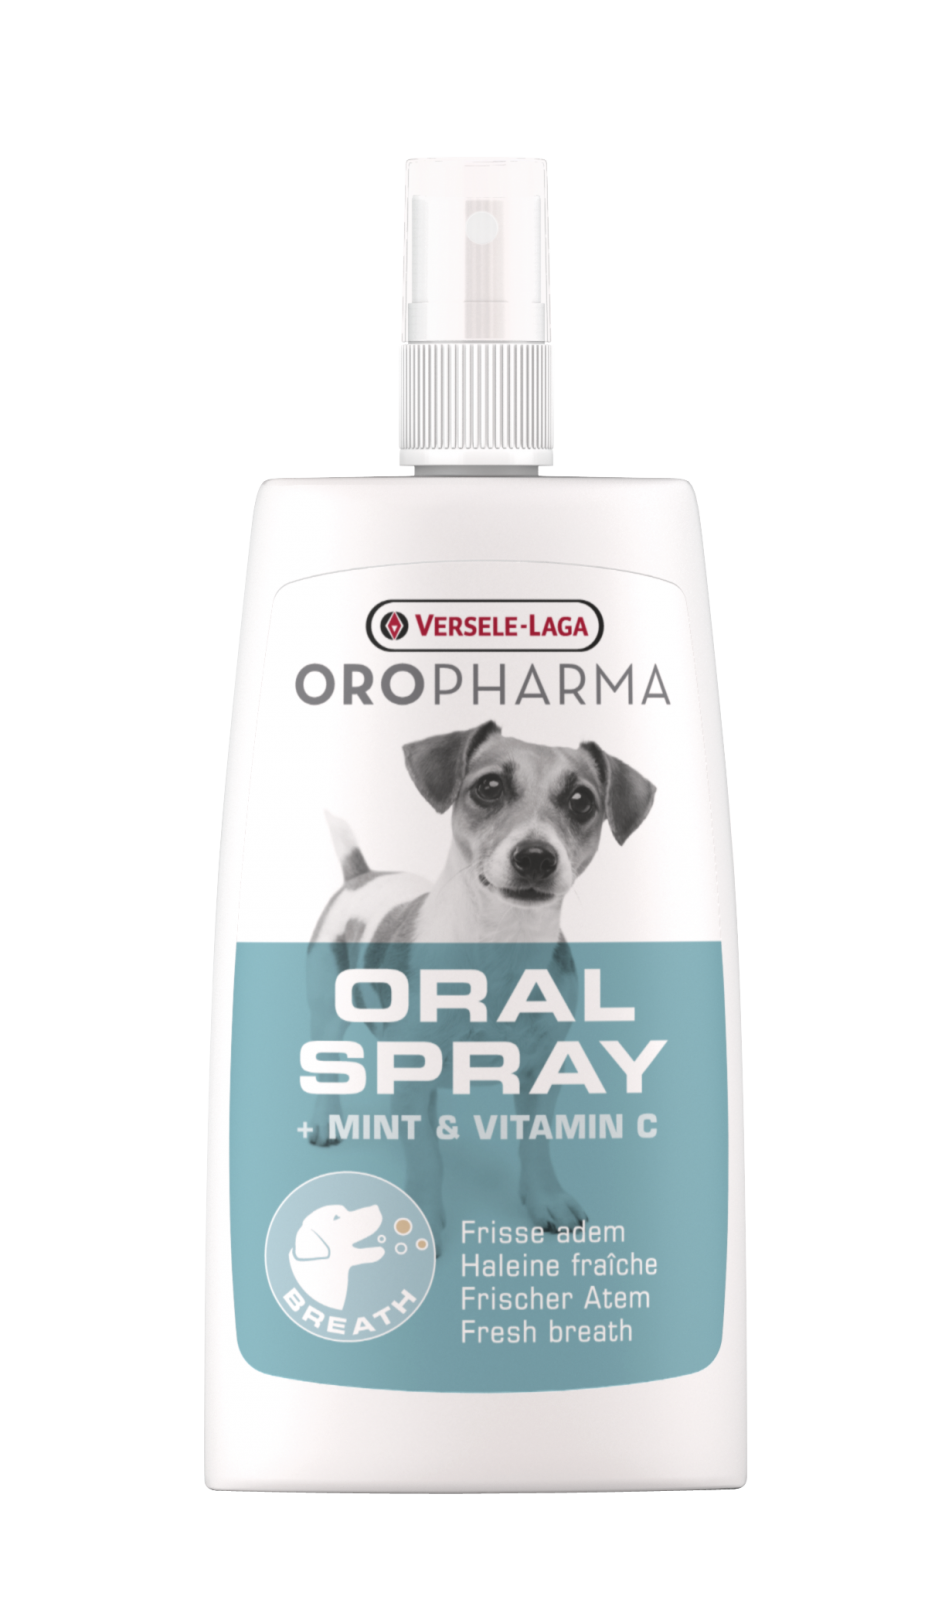 Versele-Laga-Oropharma-Oral-Spray-150-ml.png